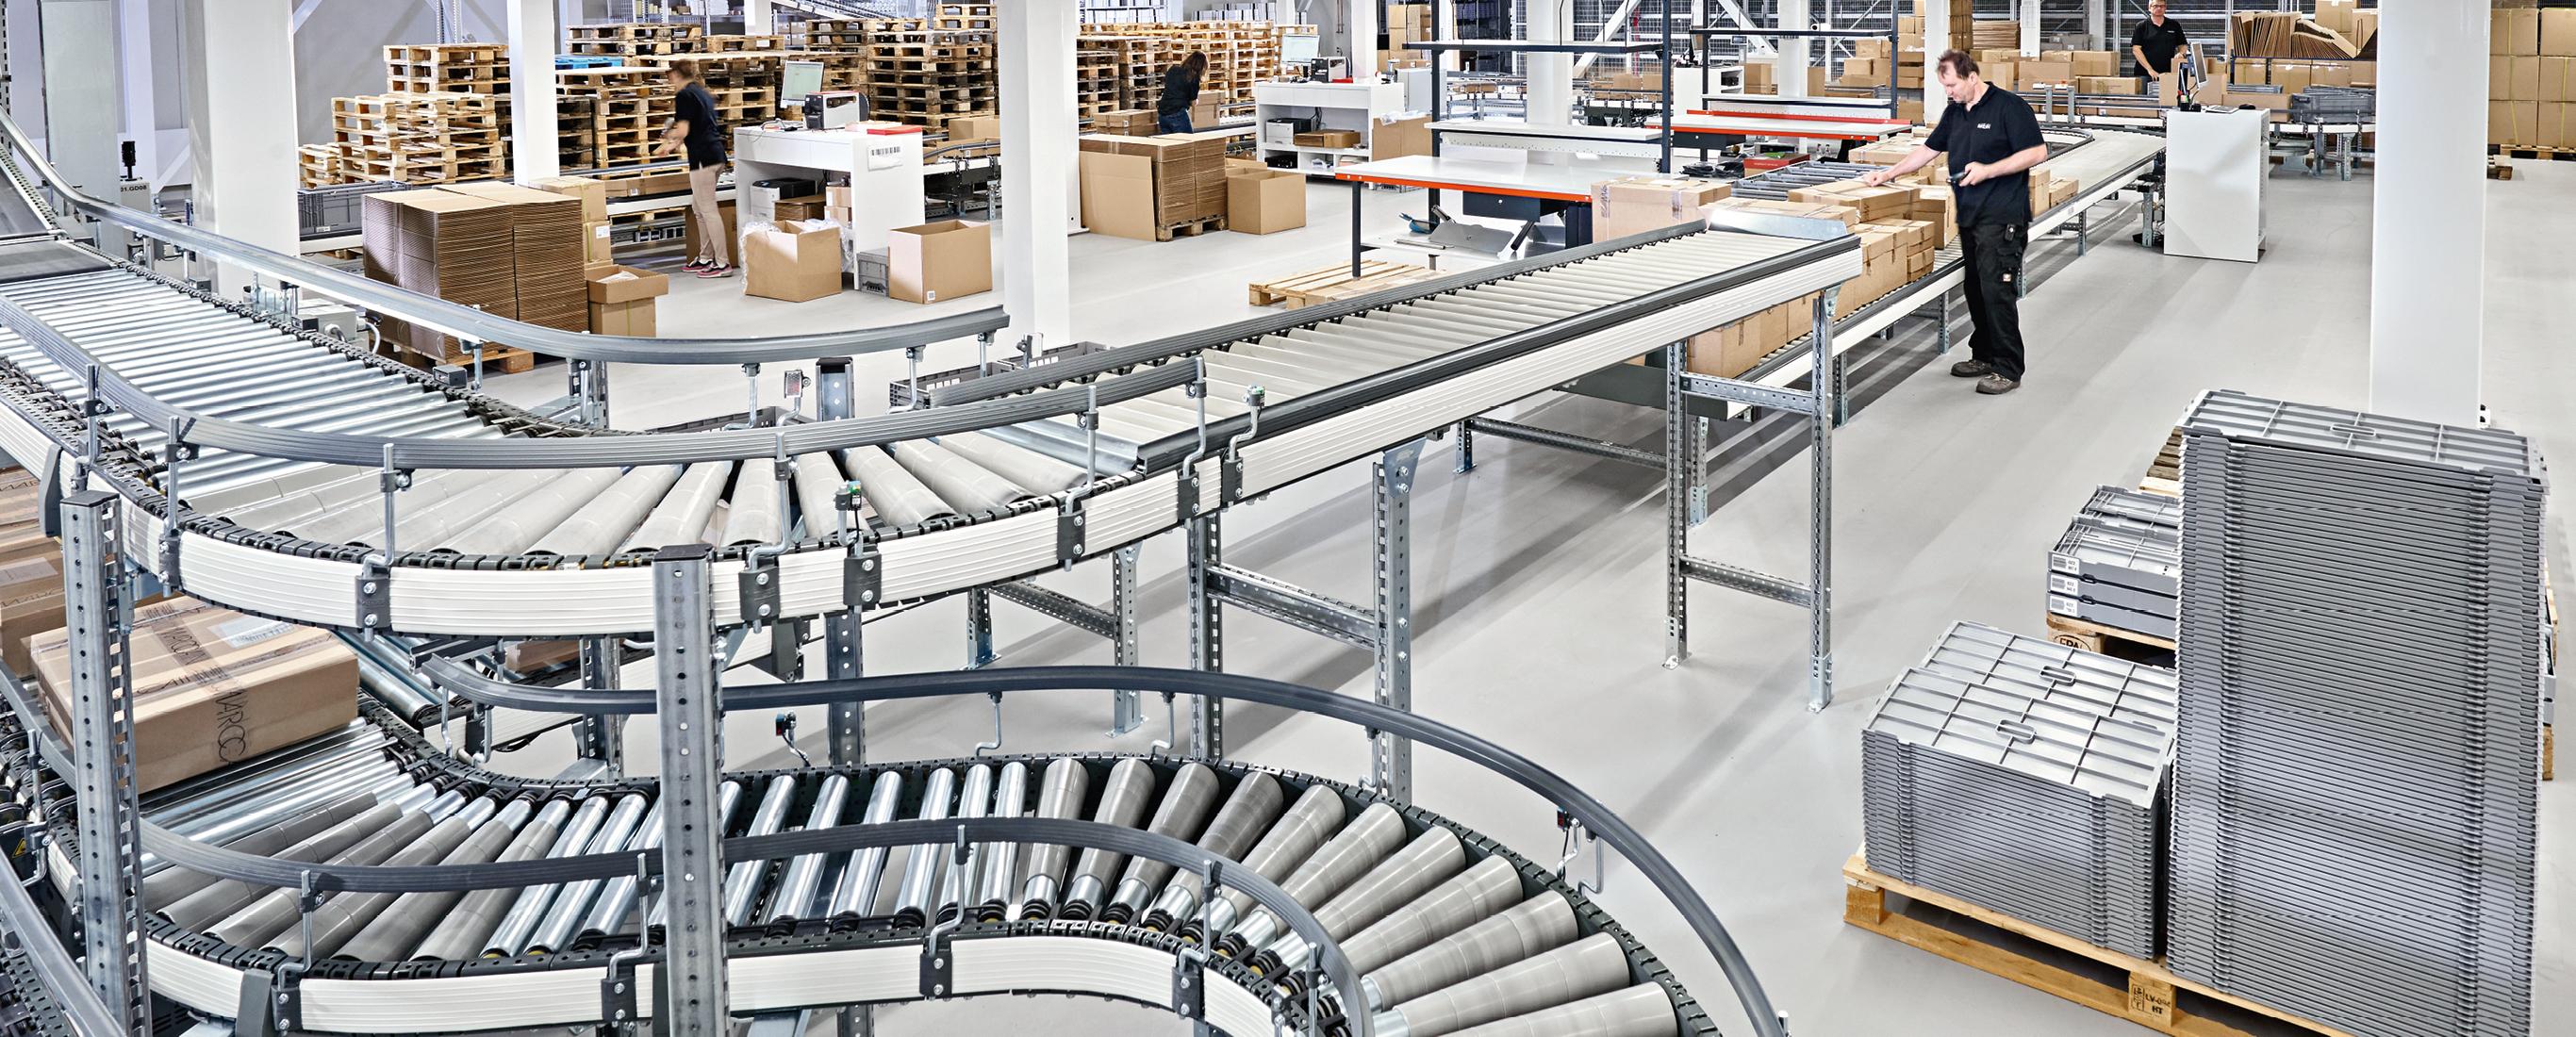 Unternehmen-Logistics-Slideshow_10